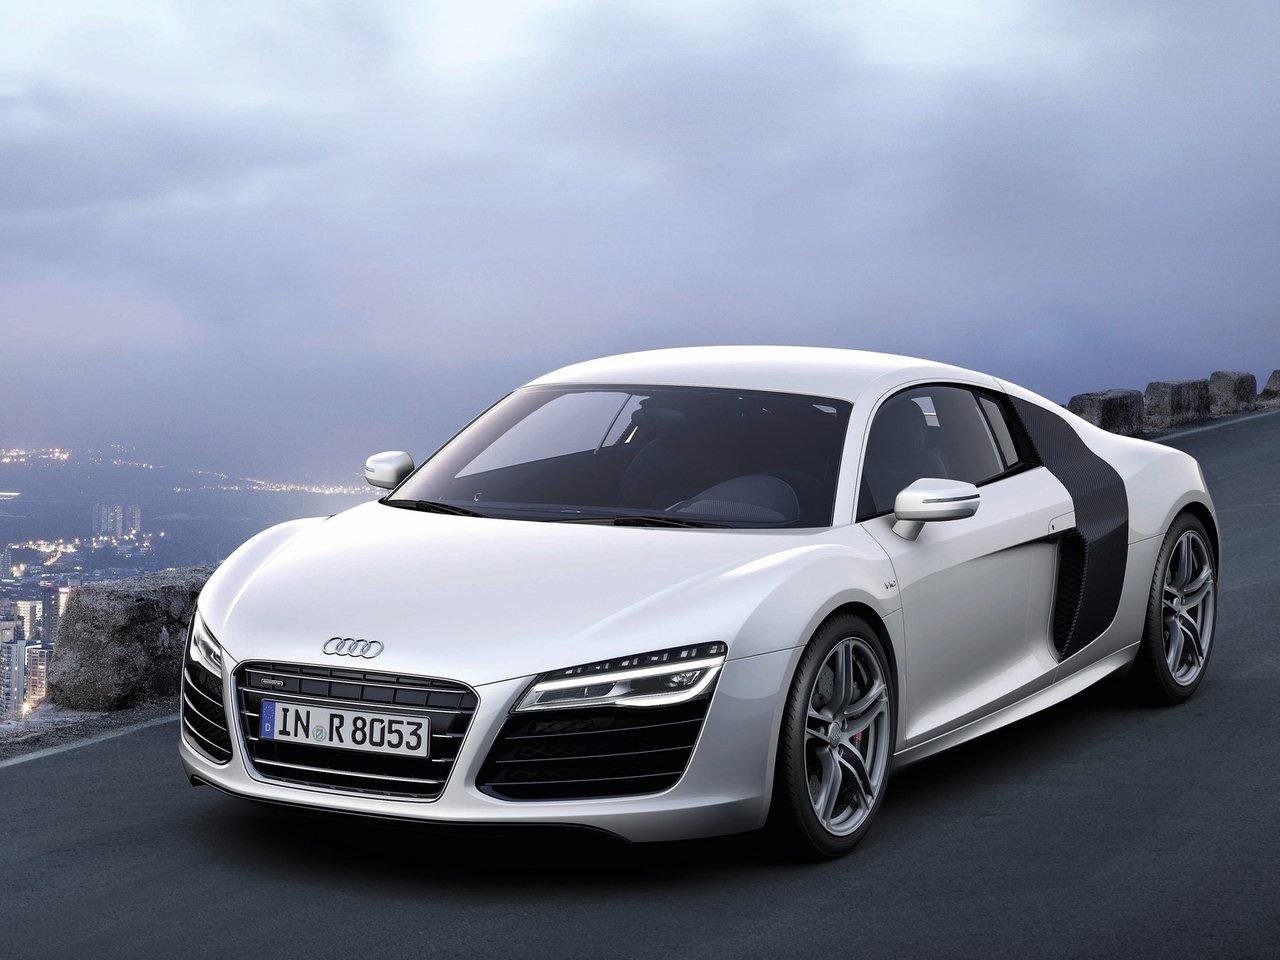 2013 Audi R8 V10 Silver Wallpapers ImageBankbiz 1280x960